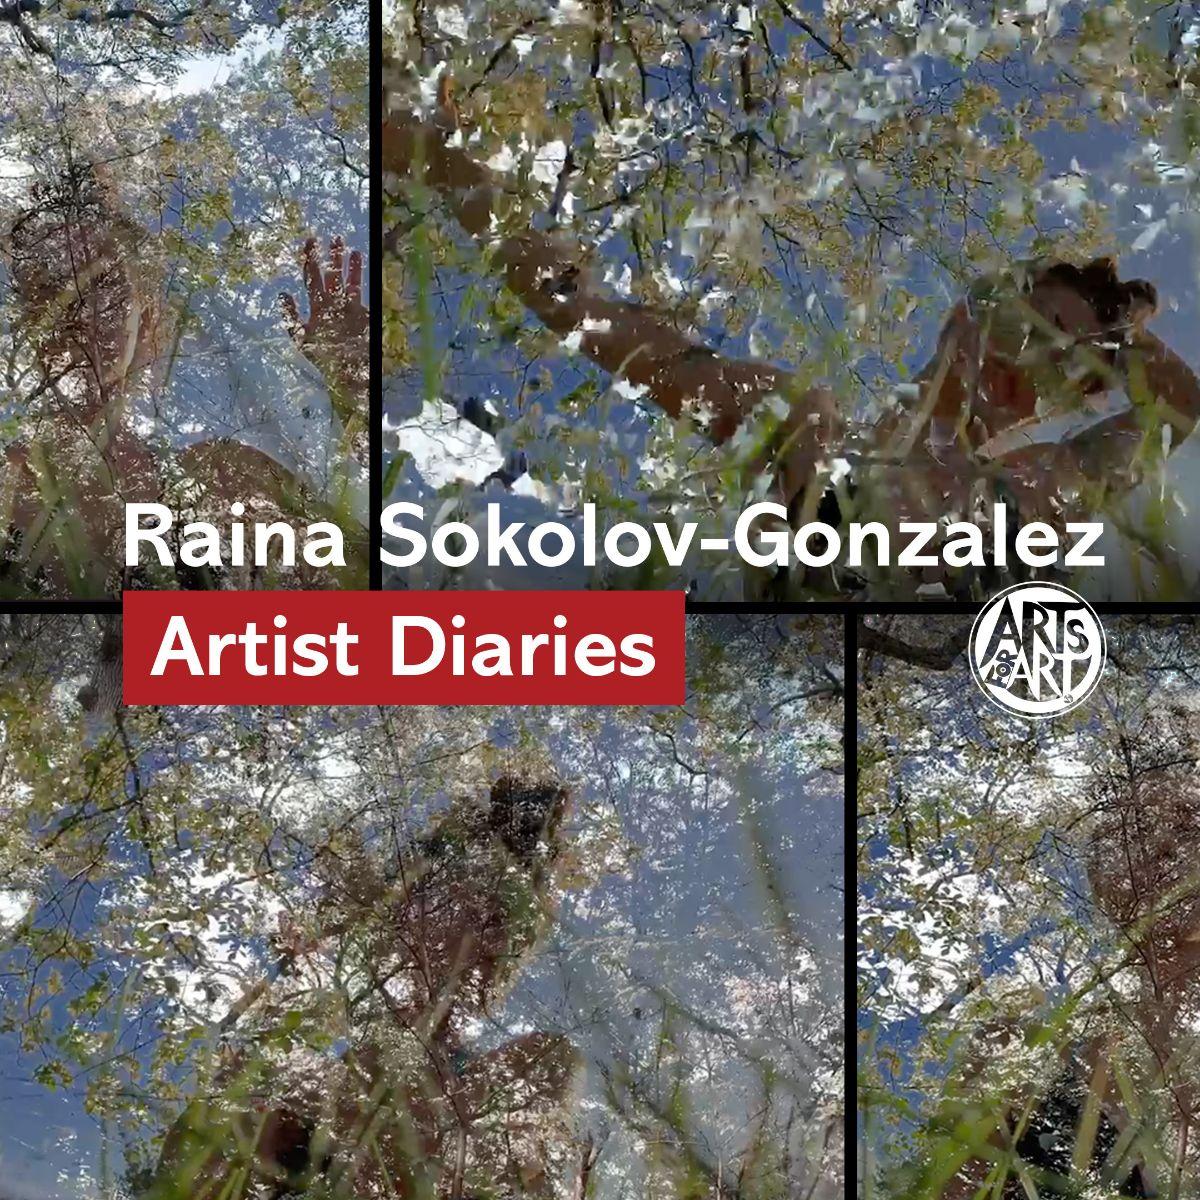 Raina Sokolov-Gonzalez